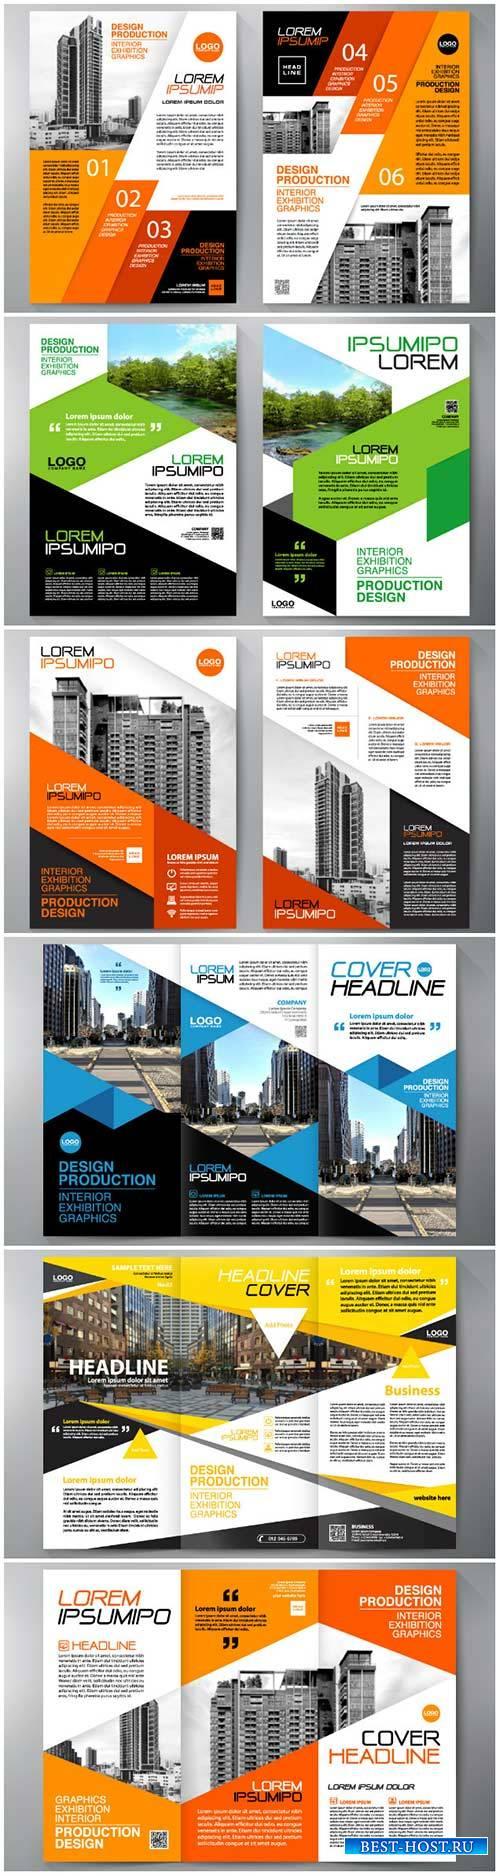 Business brochure flyer design vector template, magazine flyer mockup